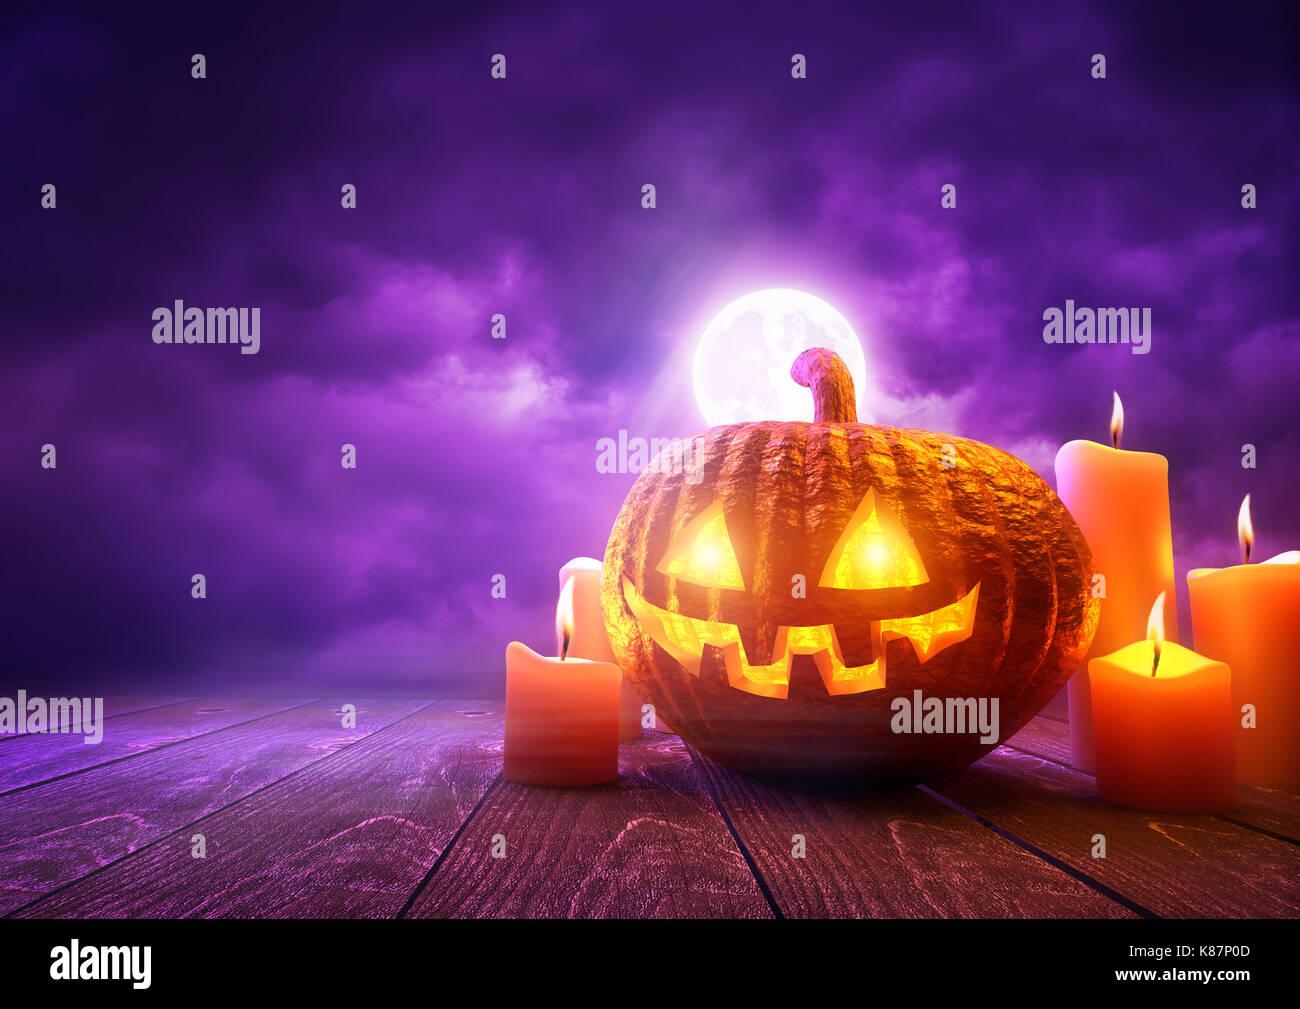 A glowing Pumpkin Jack-O-Lantern against purple sky background on Halloween, mixed media illustration. - Stock Image